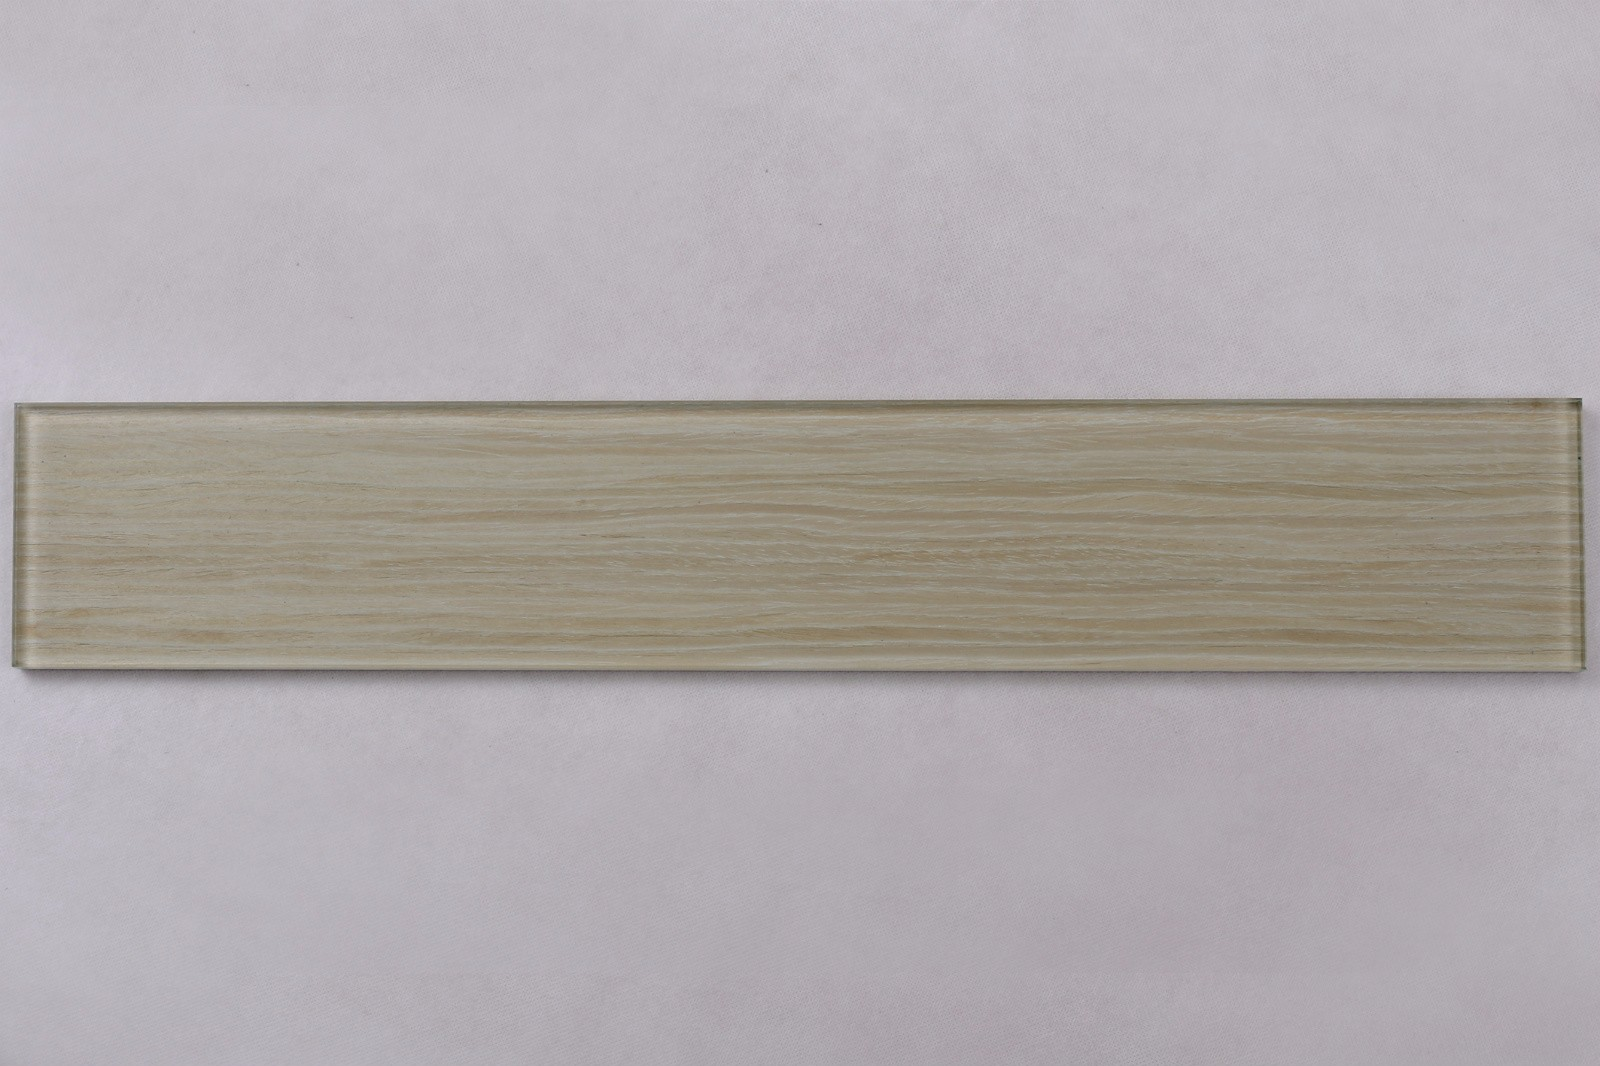 Heng Xing-Oem Mosaic Glass Price List | Hengsheng Glass Mosaic